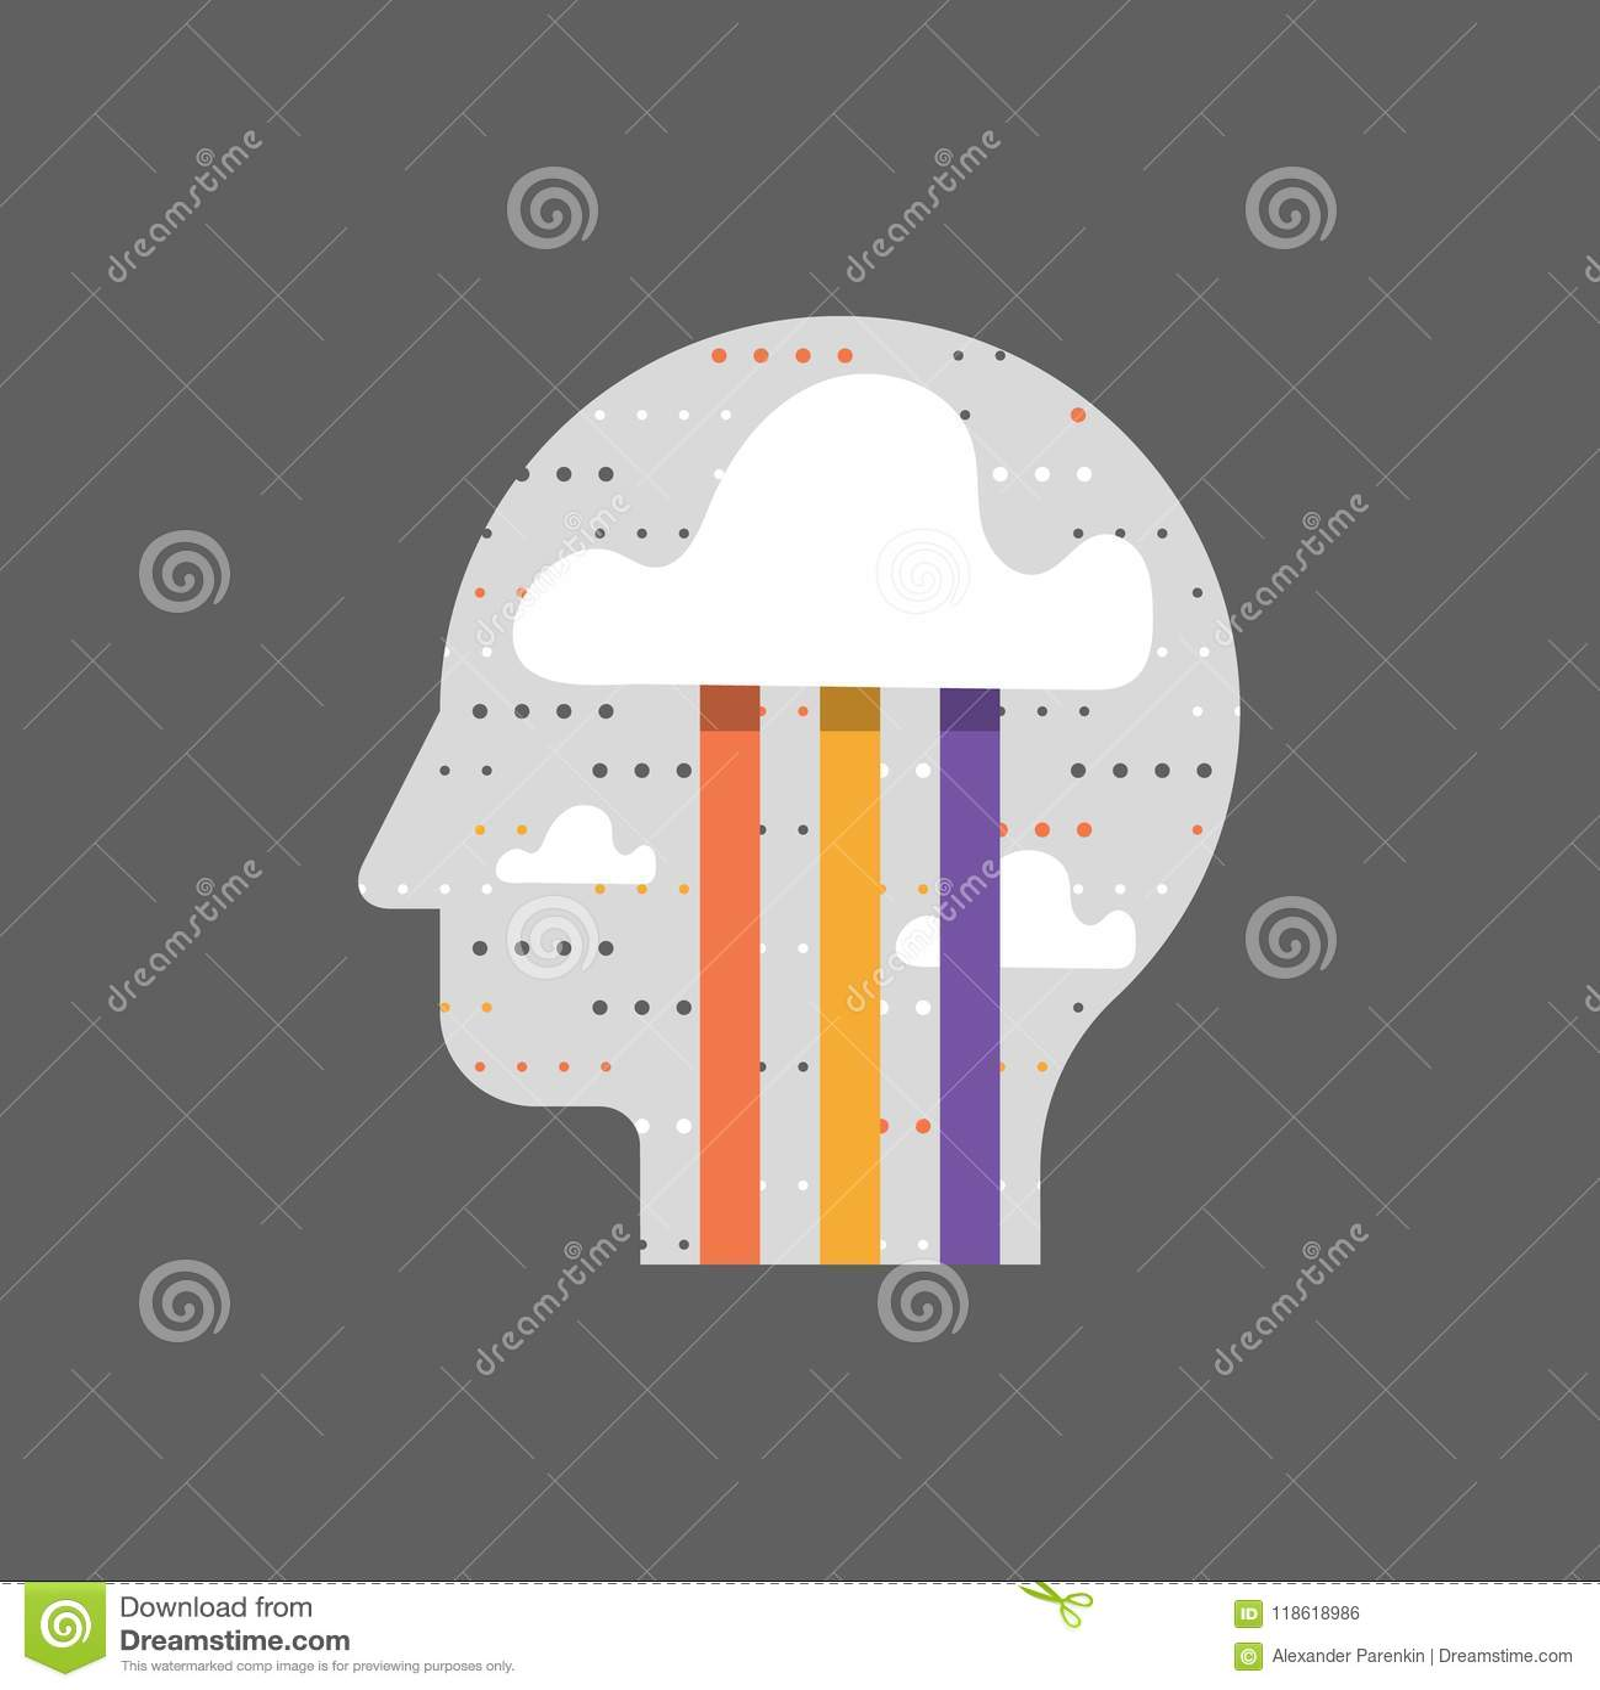 Mindfulness και θετική σκέψη, έννοια καταιγισμού ιδεών, δημιουργικότητα και φαντασία, ευτυχία και καλή διάθεση